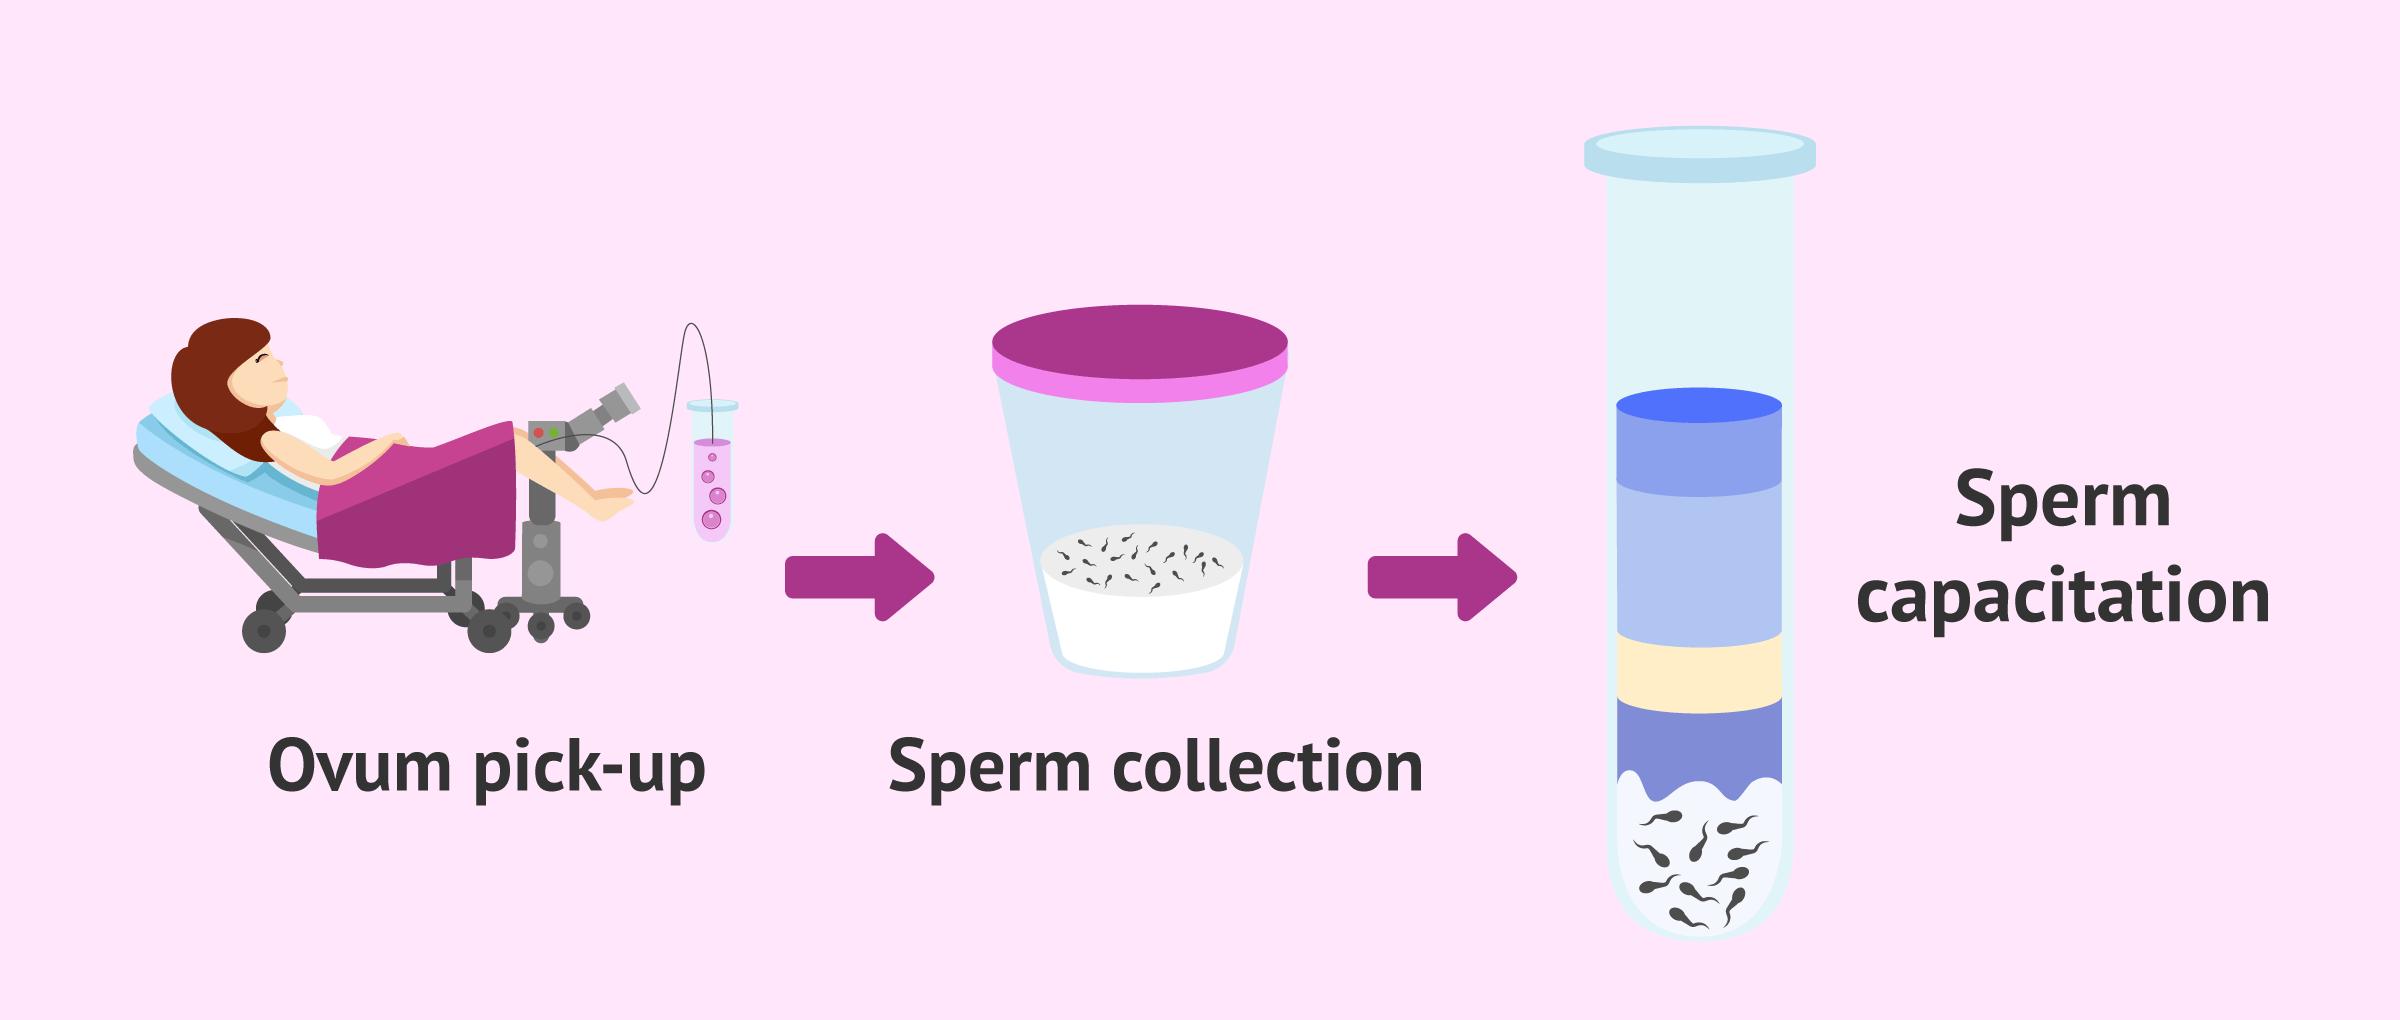 Processing the semen sample